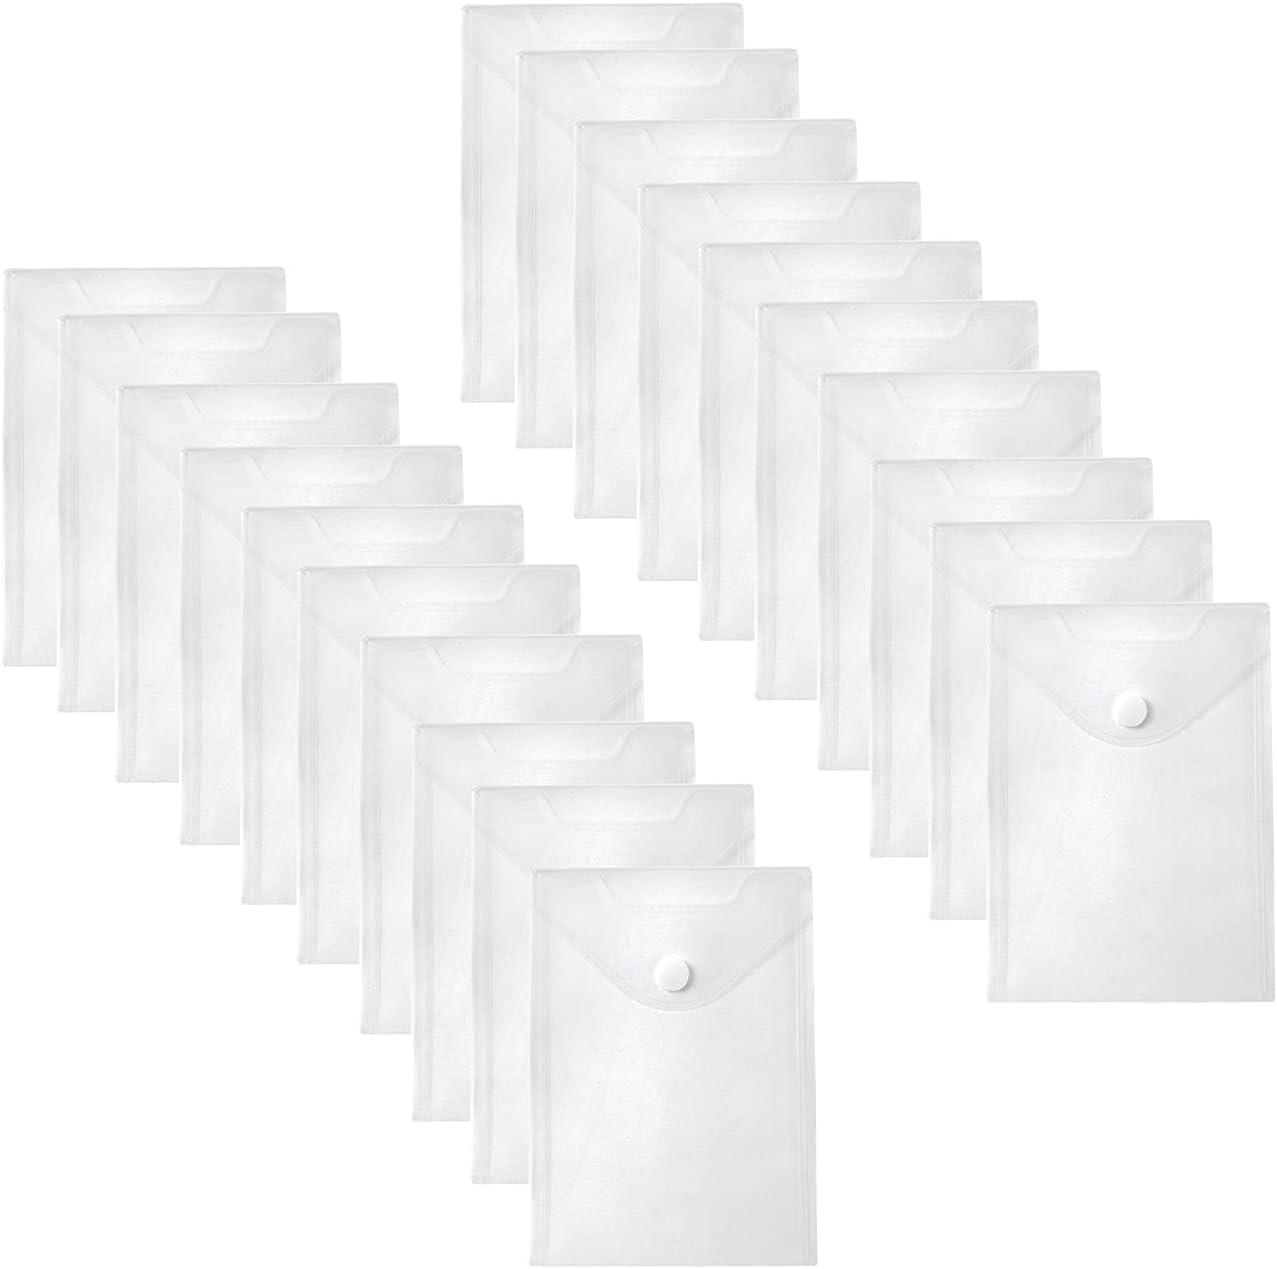 YESSART 7x9 Clear Plastic Envelopes Hook Loop Closure Receipt Stickers Storage Holder 20 Pack